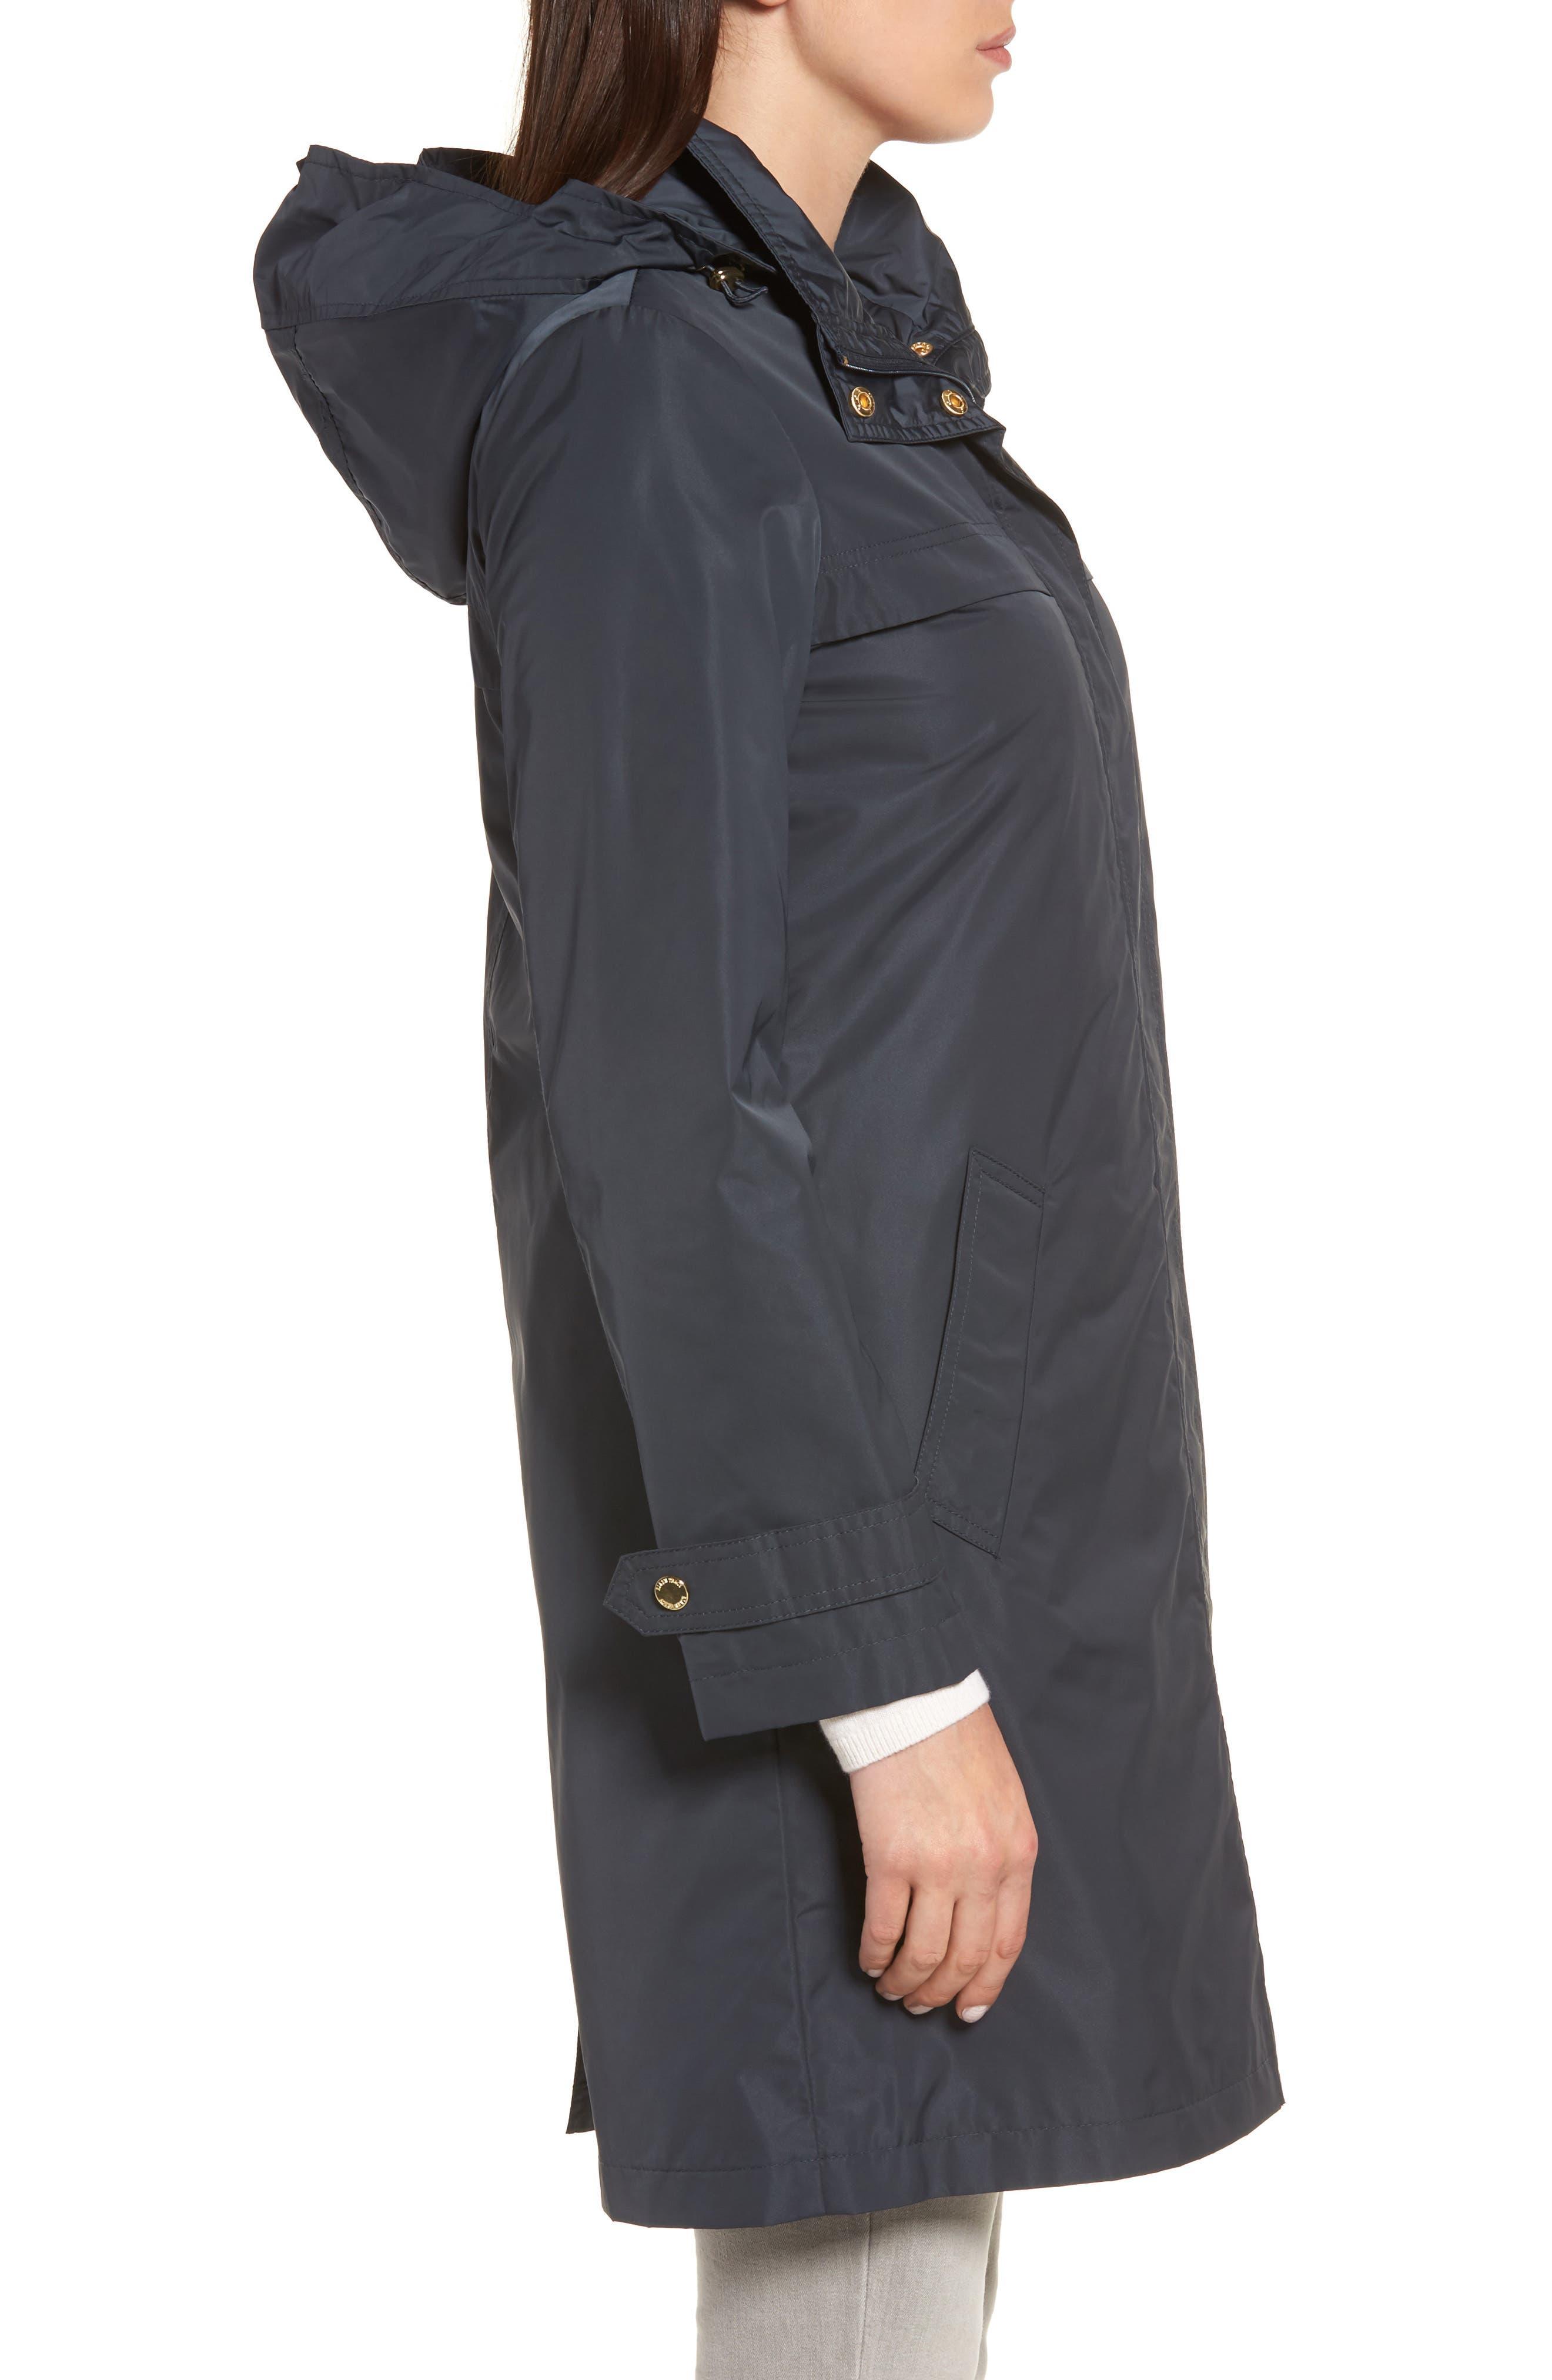 Raincoat with Detachable Hood,                             Alternate thumbnail 3, color,                             Navy